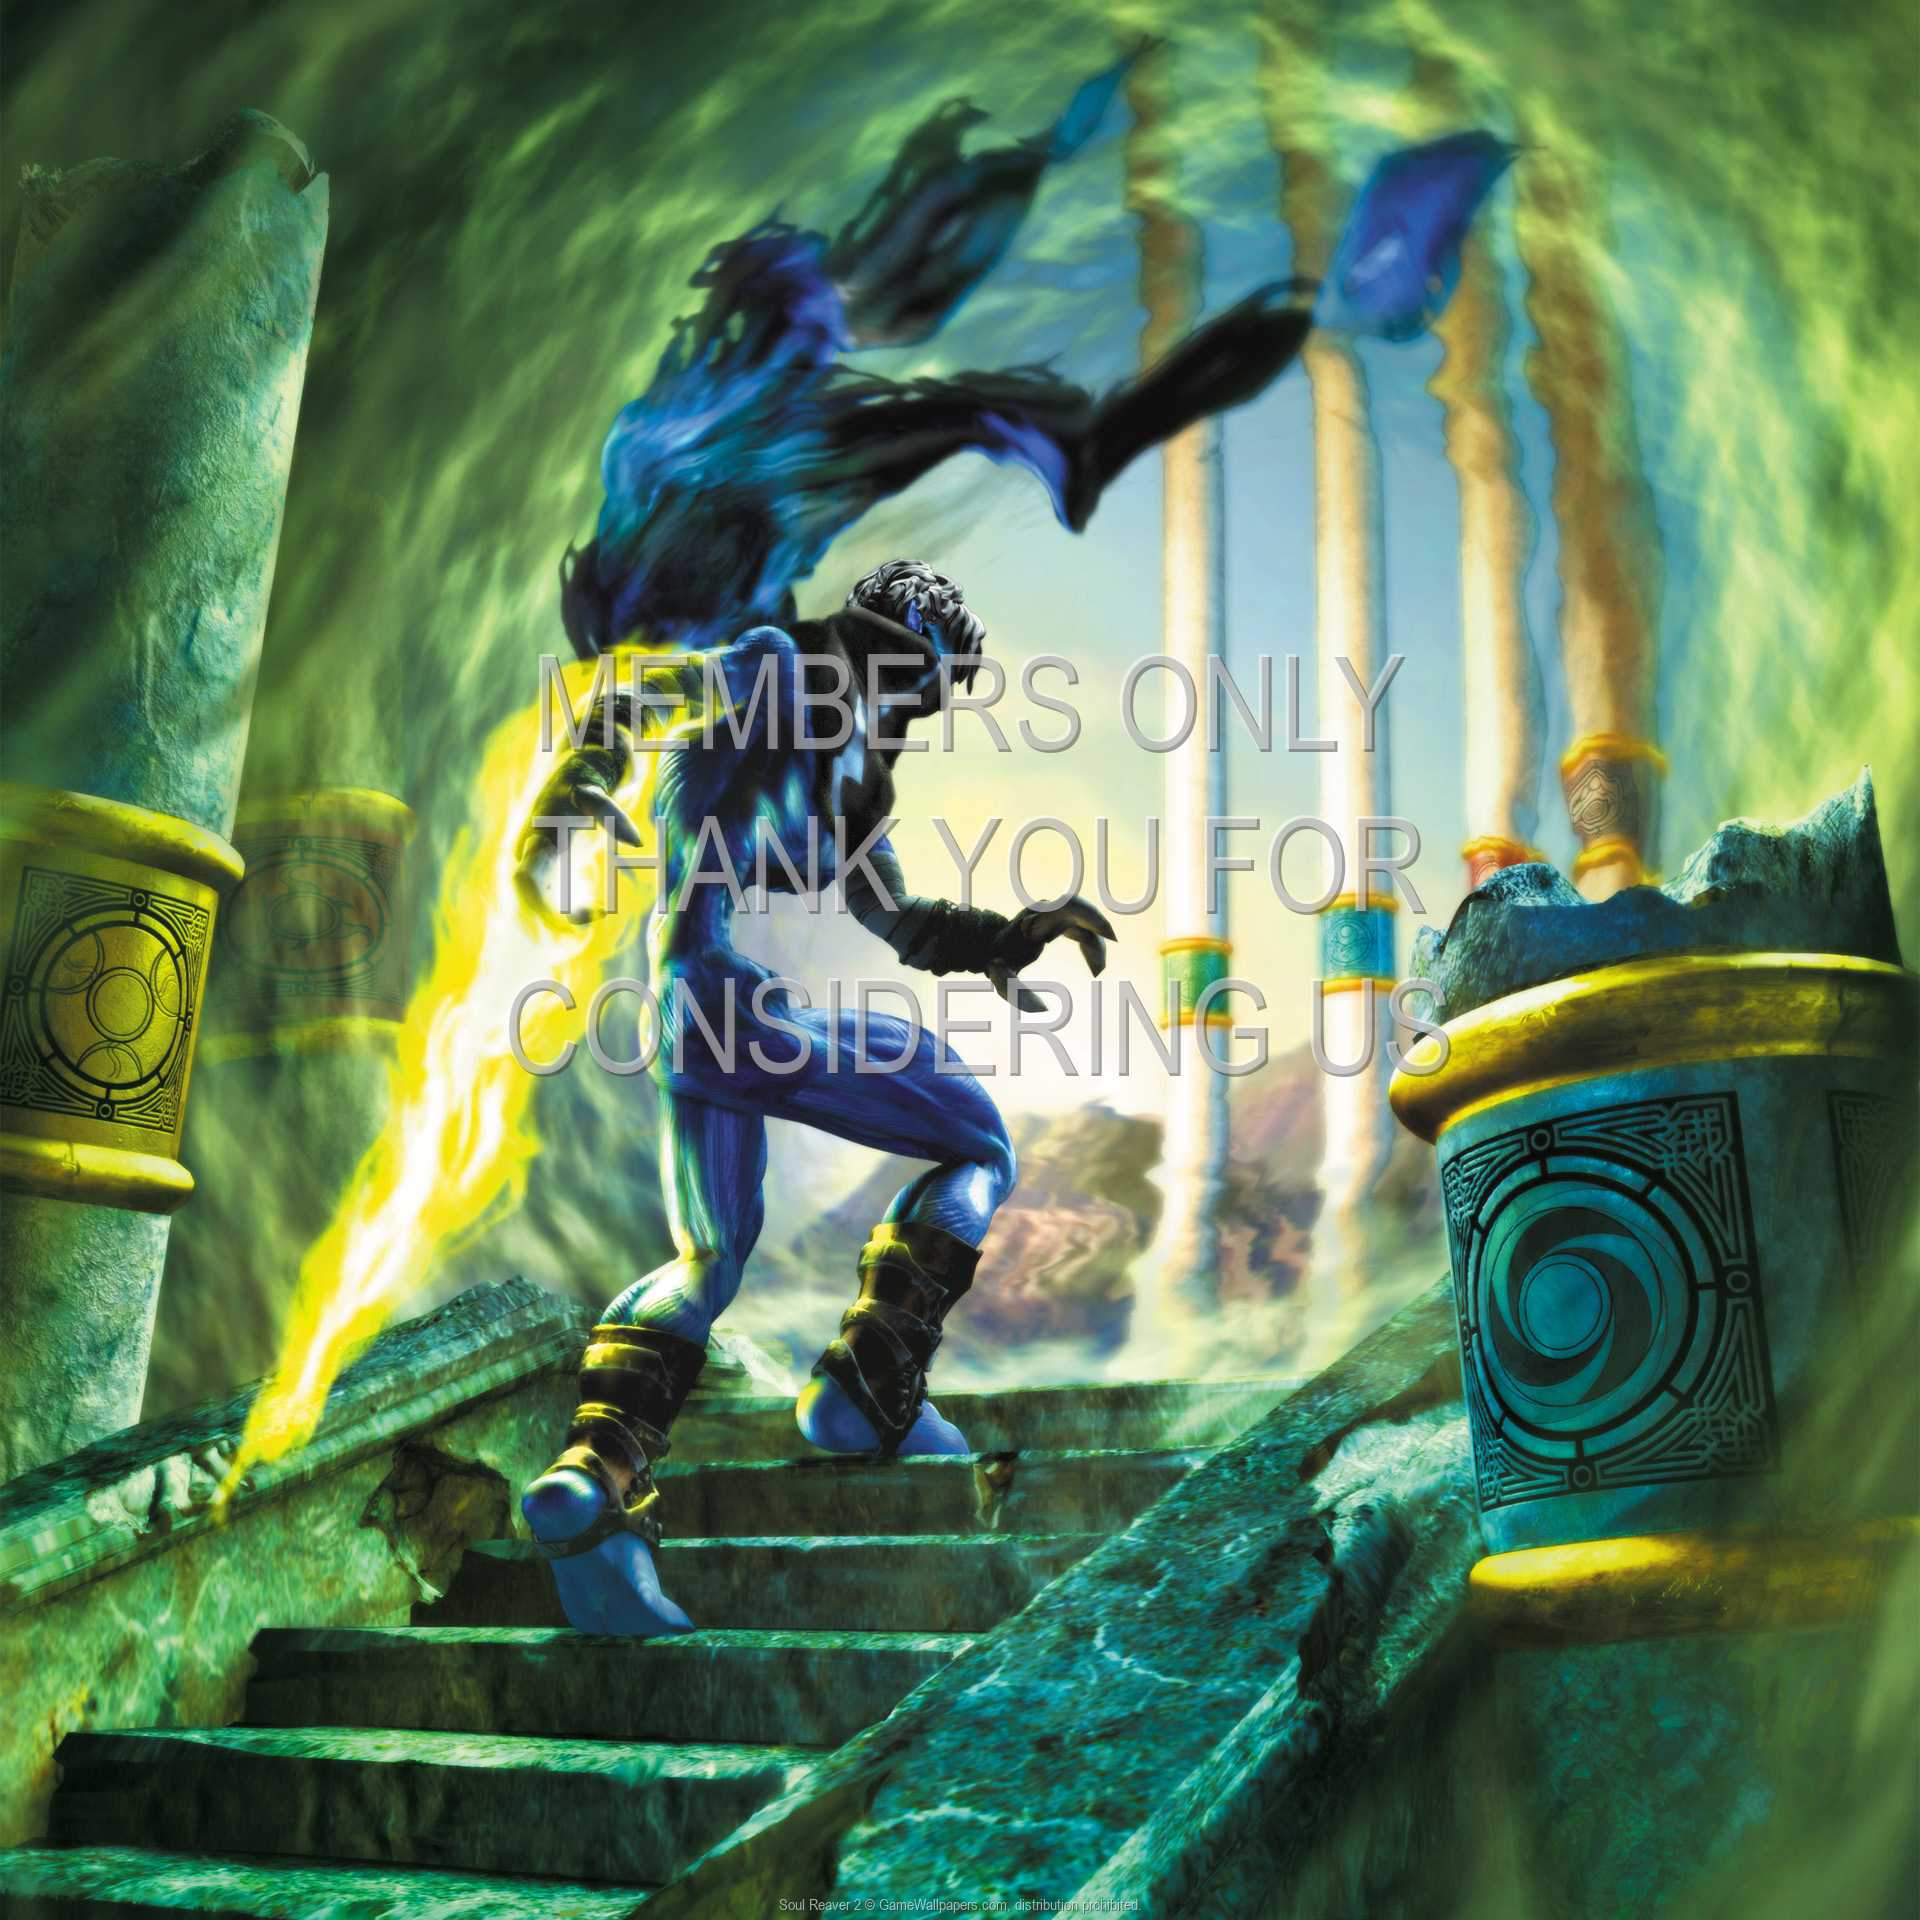 Soul Reaver 2 1080p Horizontal Mobile wallpaper or background 09